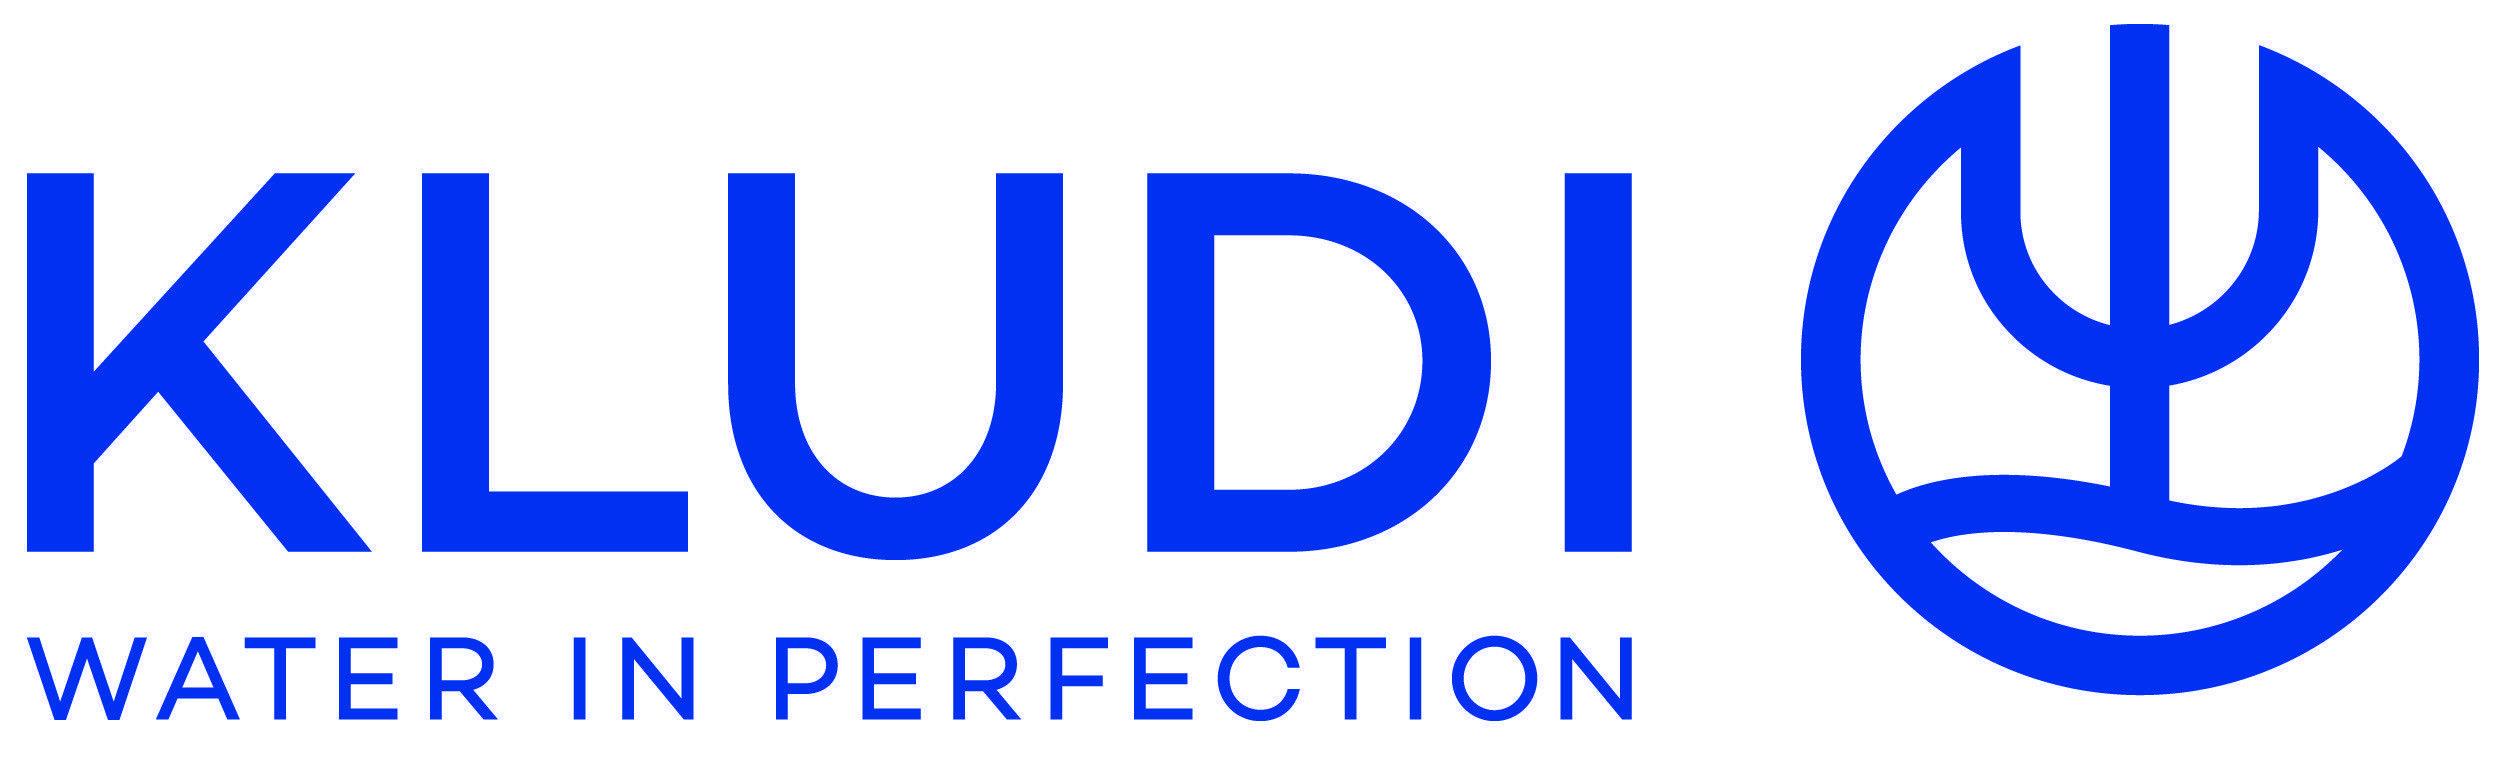 Imagini pentru kludi logo